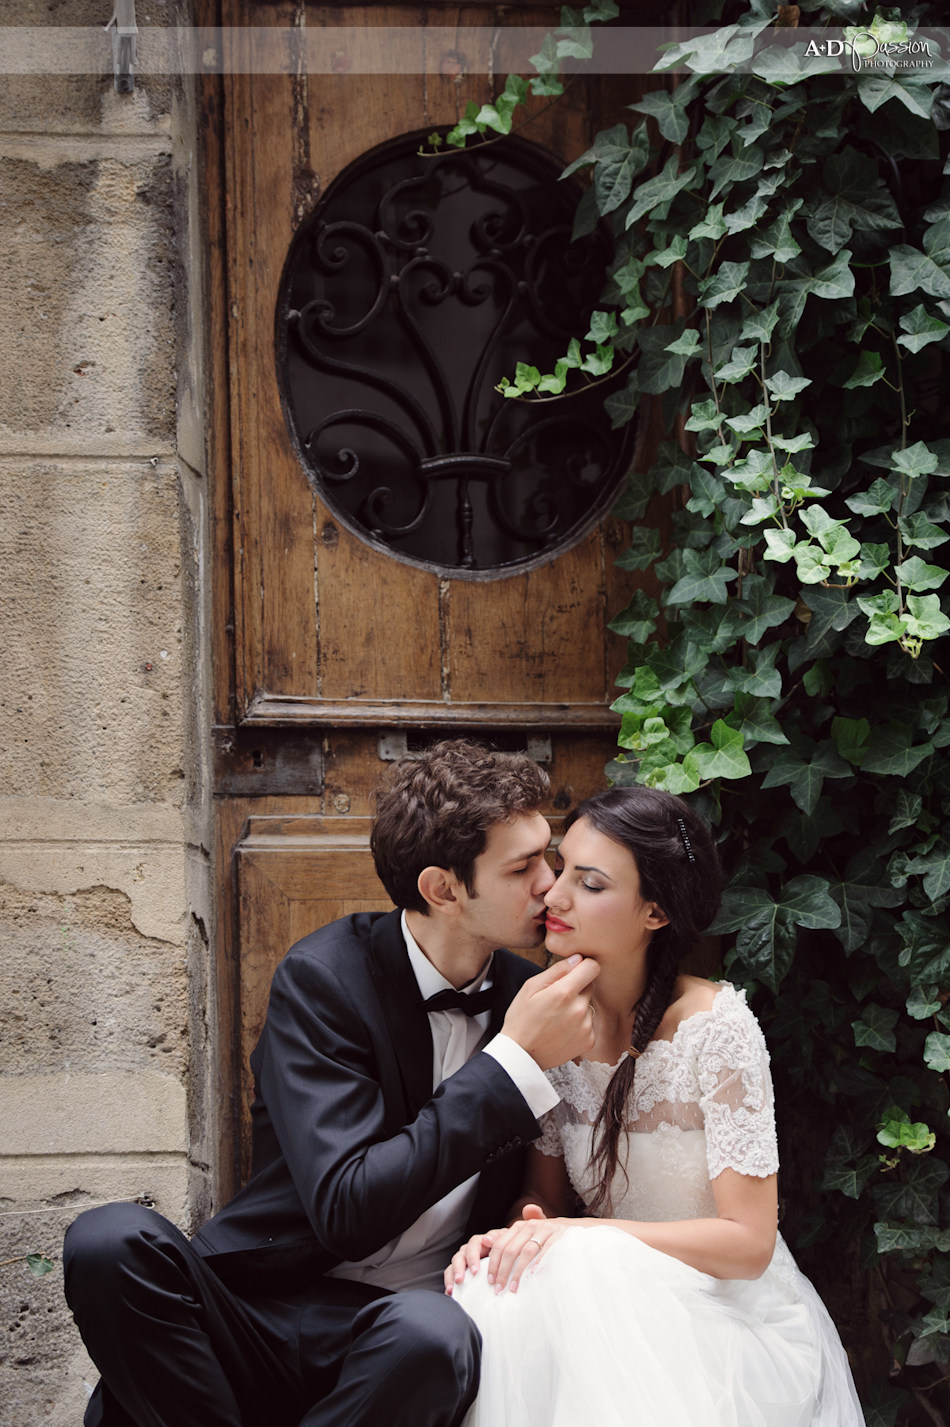 AD Passion Photography | 20120902_ad-passion_fotograf-profesionist-de-nunta_Andreea&Adi_AfterWedding-TrashTheDress_Paris_0091 | Adelin, Dida, fotograf profesionist, fotograf de nunta, fotografie de nunta, fotograf Timisoara, fotograf Craiova, fotograf Bucuresti, fotograf Arad, nunta Timisoara, nunta Arad, nunta Bucuresti, nunta Craiova